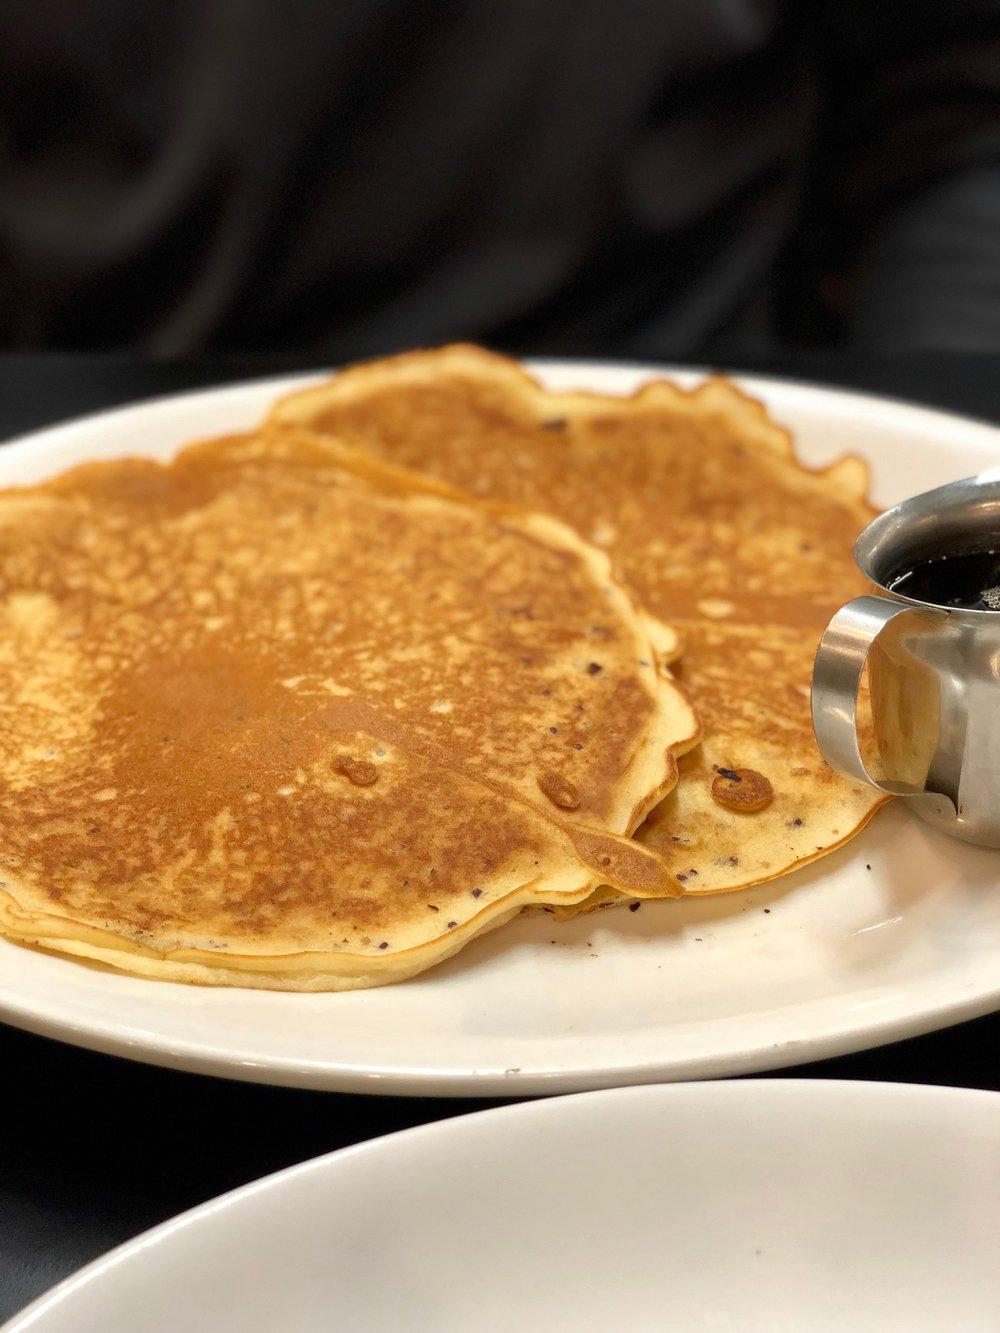 ~1524344564~Kingside Diner Pancakes.jpg